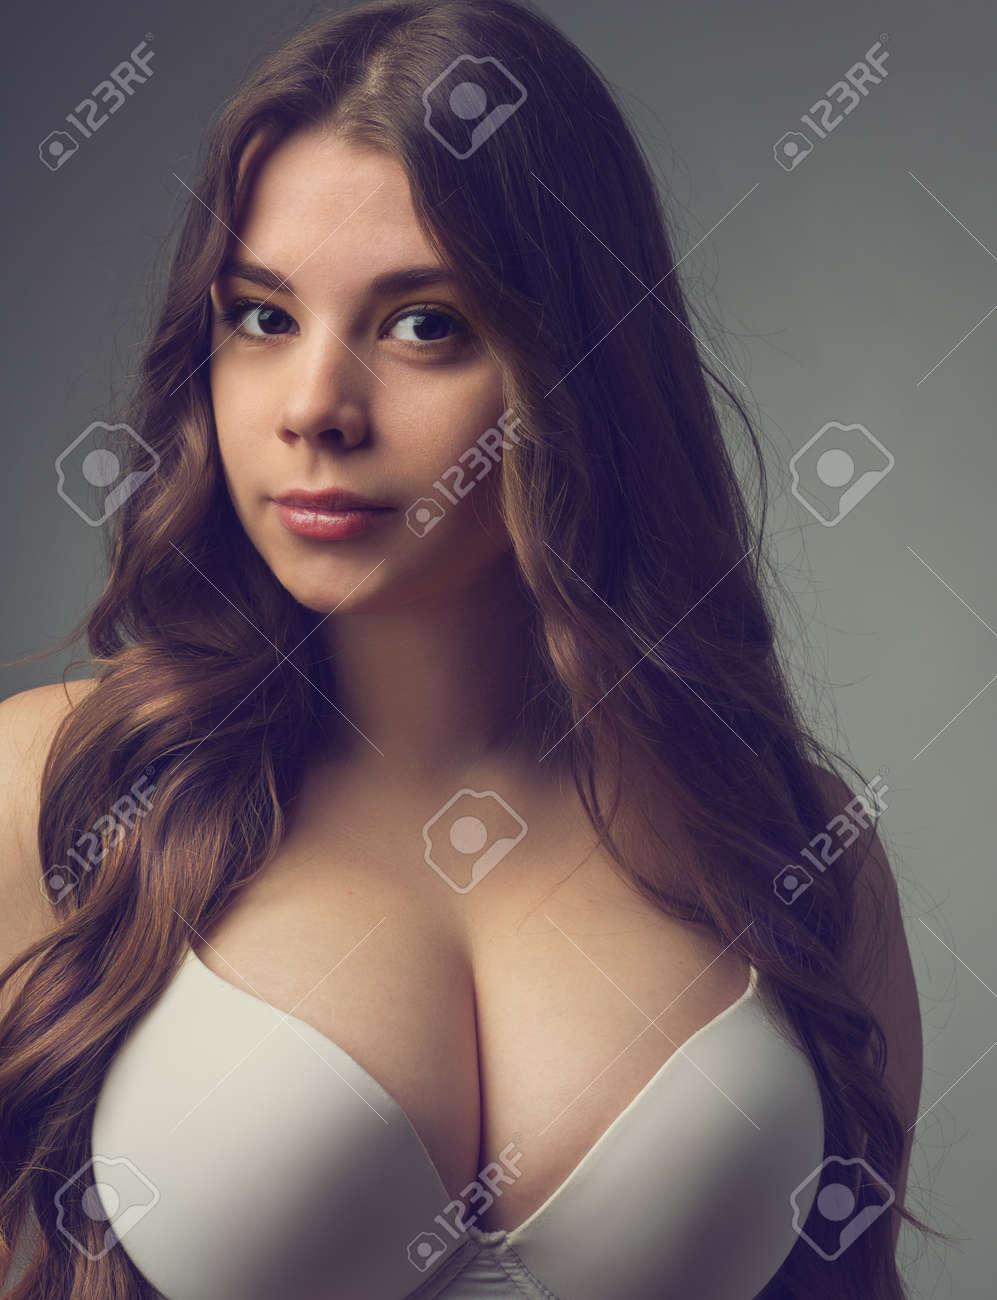 xxx female condom